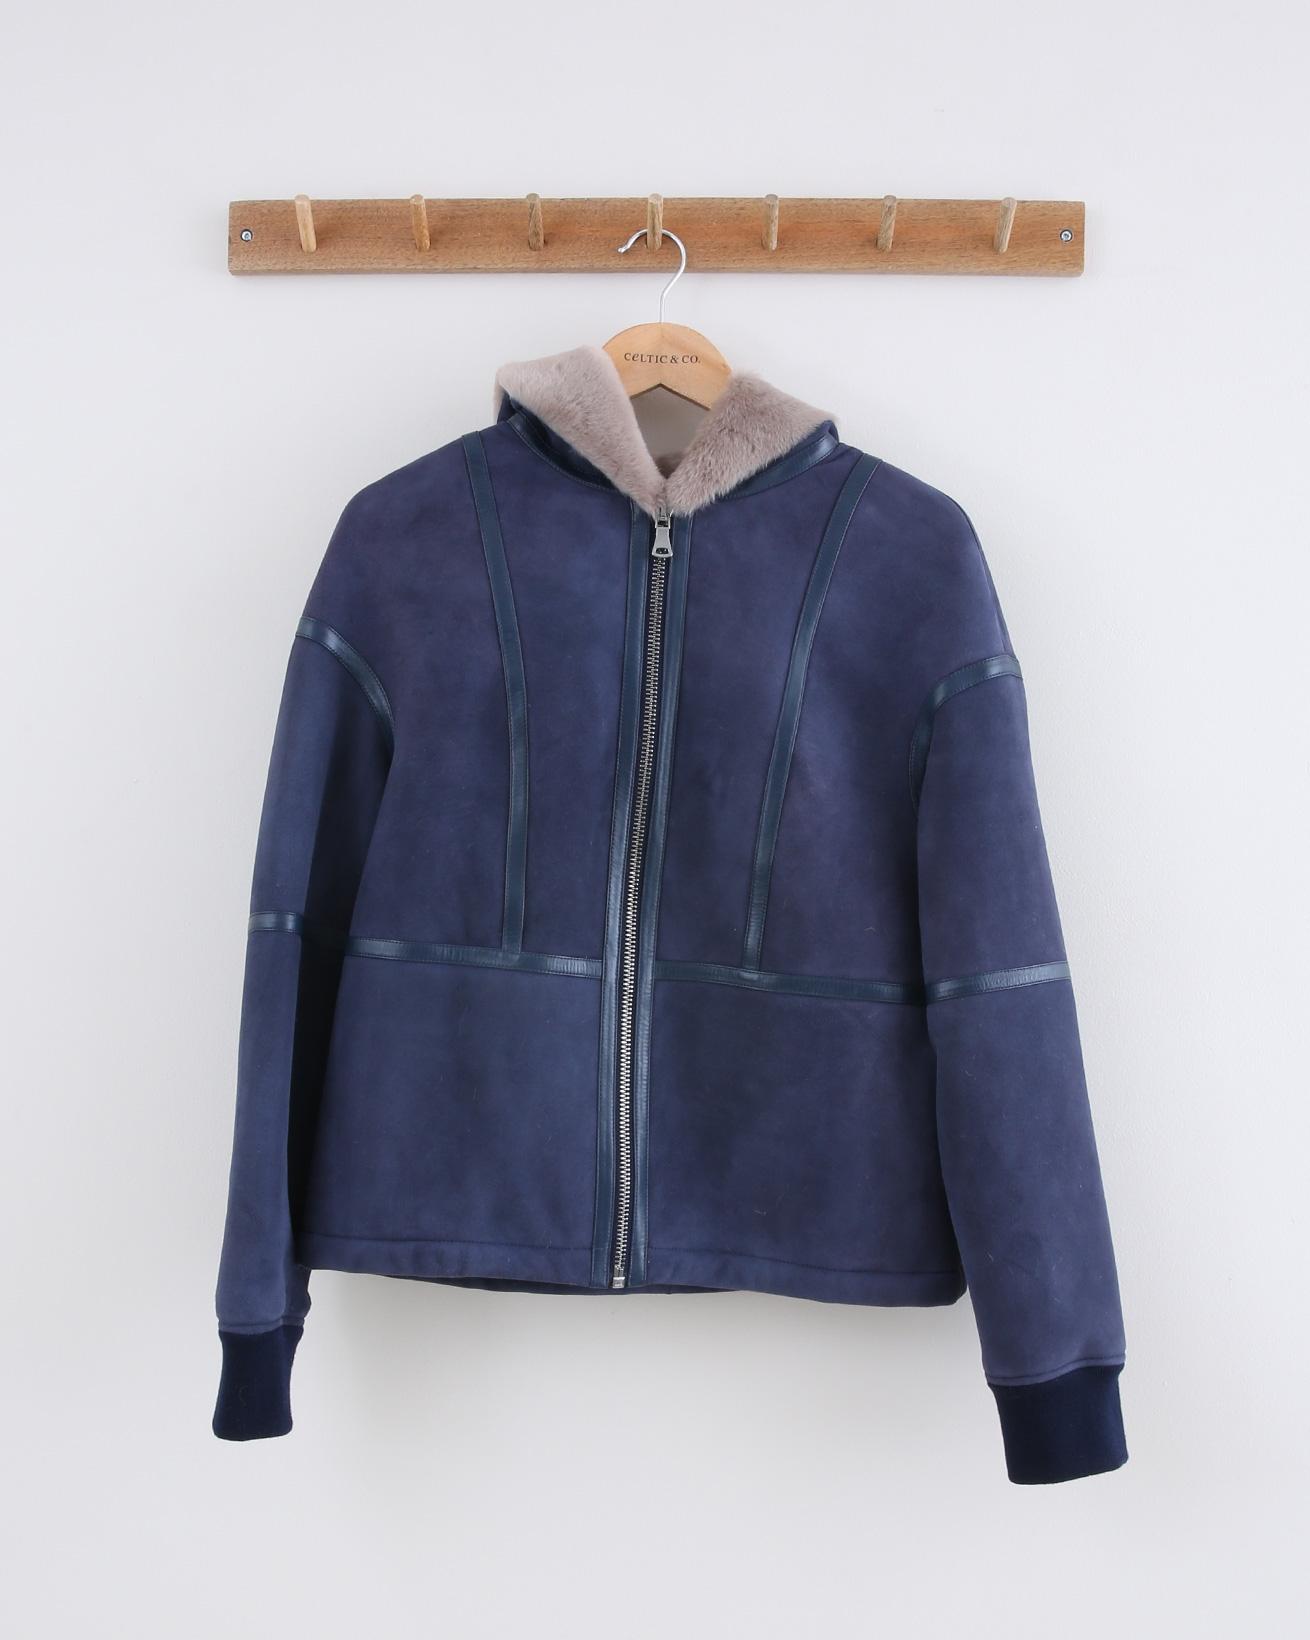 Hooded Sheepskin Jacket - Size 10 - Navy & Mink - 1471